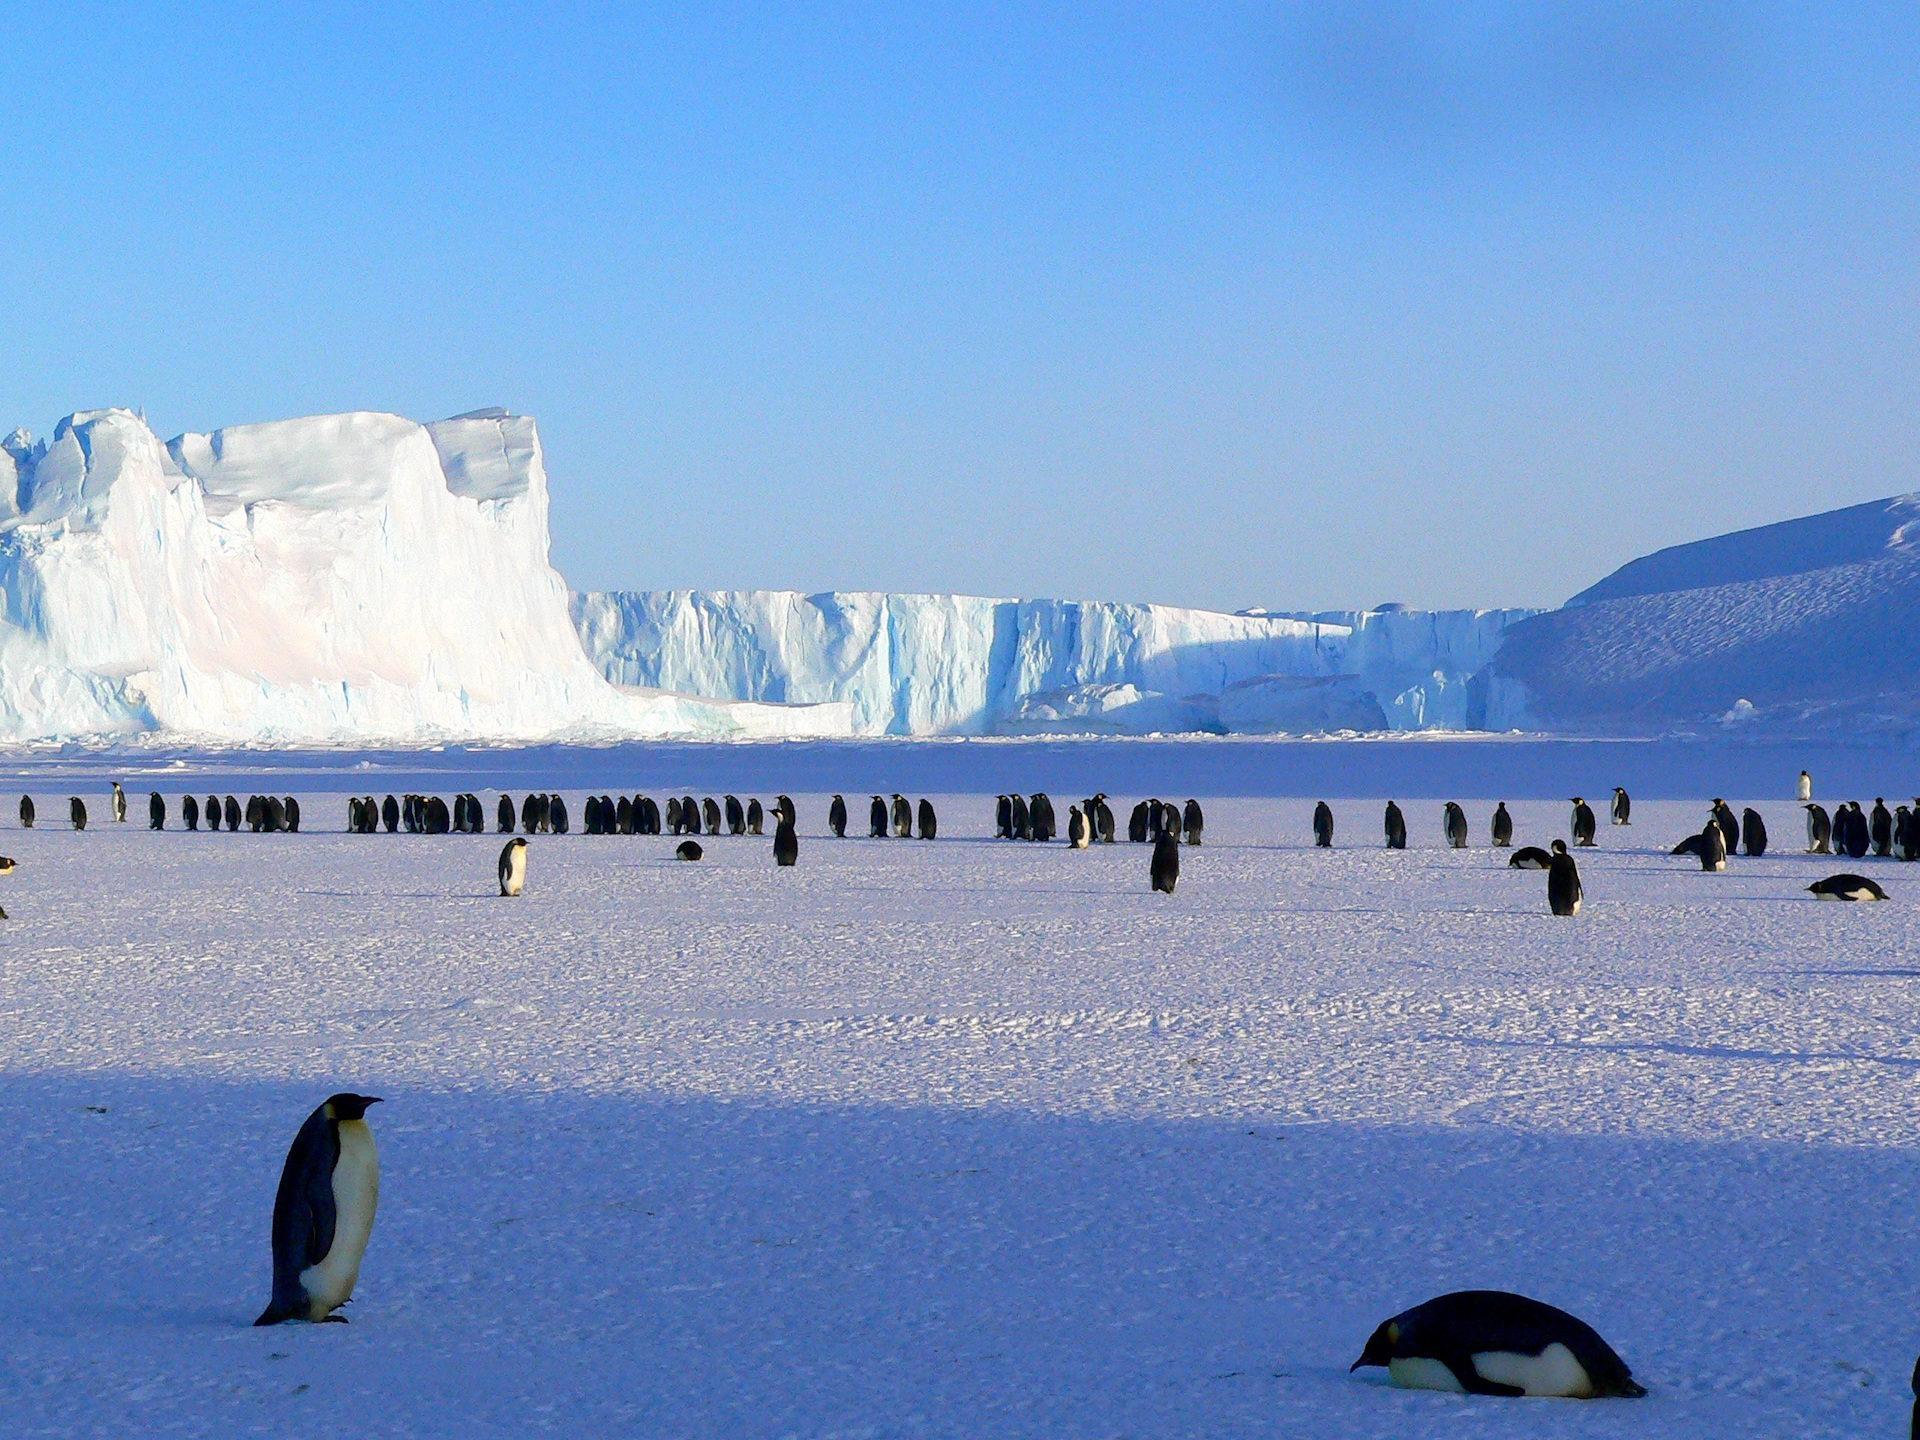 pinguinos, emperador, antartida, बर्फ, polar - HD वॉलपेपर - प्रोफेसर-falken.com